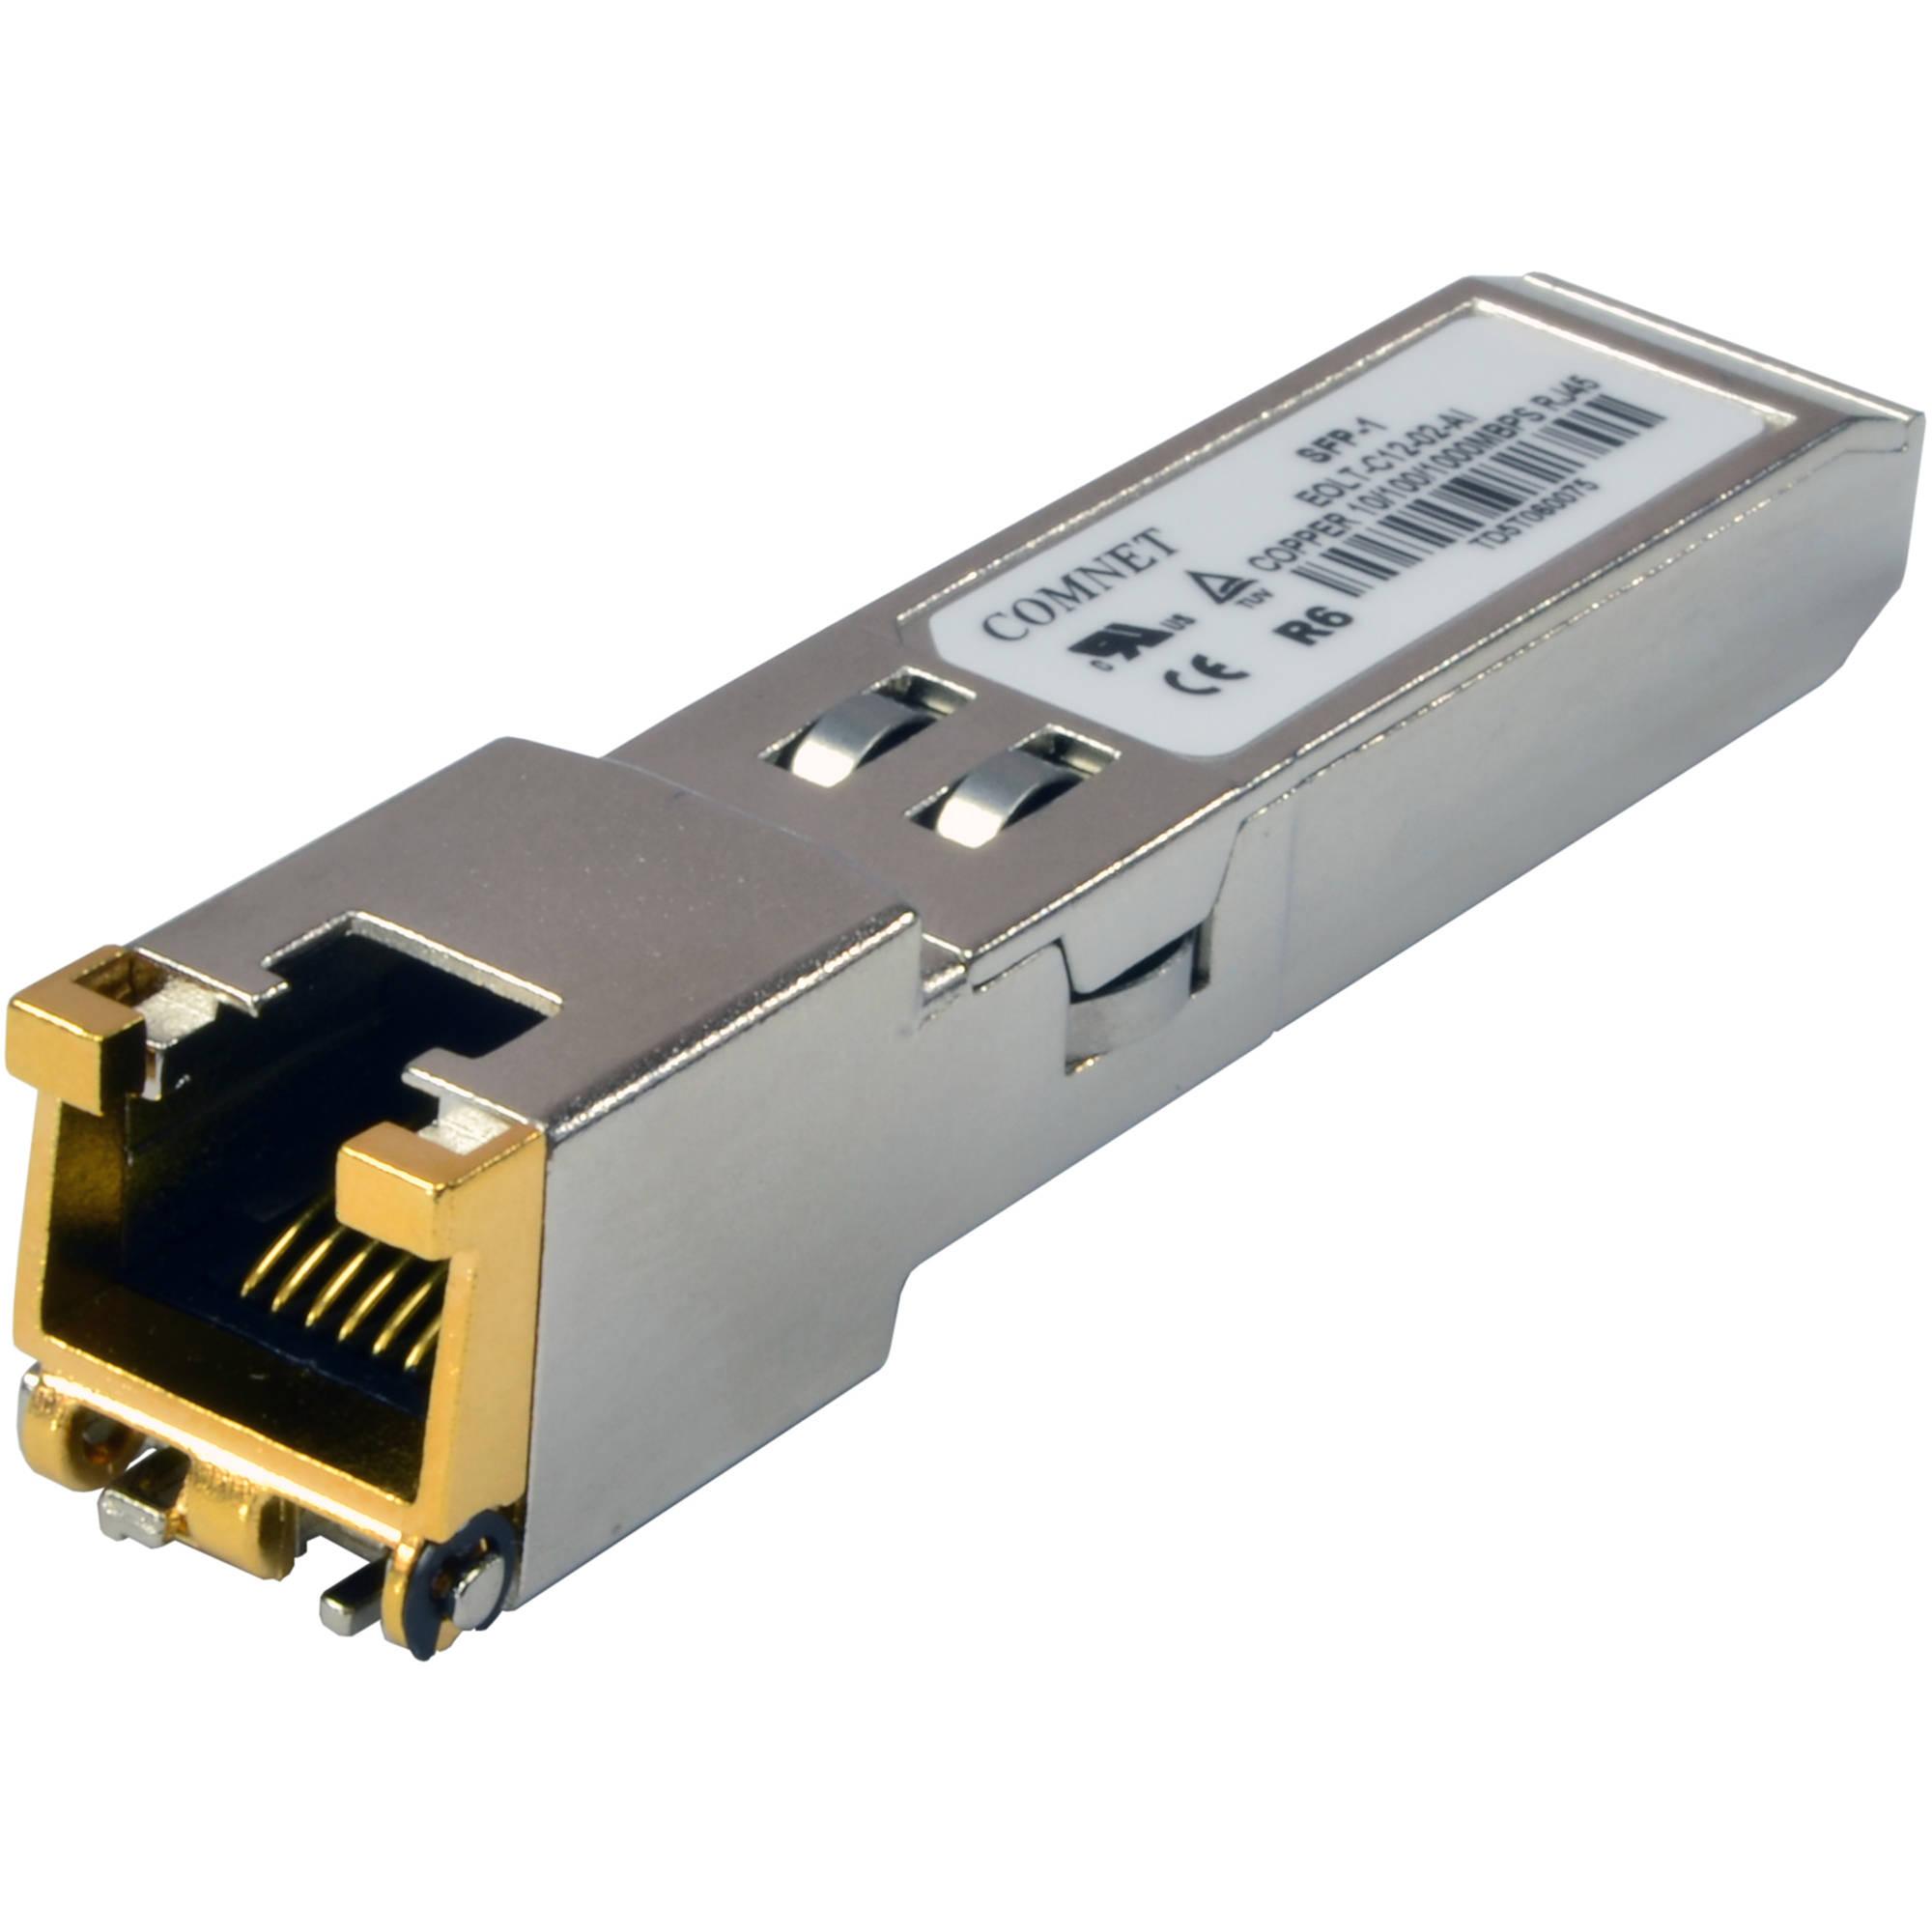 COMNET 1000Mbps SFP Single/Multimode 1310nm Transceiver (Cisco SFP  Compatible, LC Connector, 12 4 / 0 34 mi)